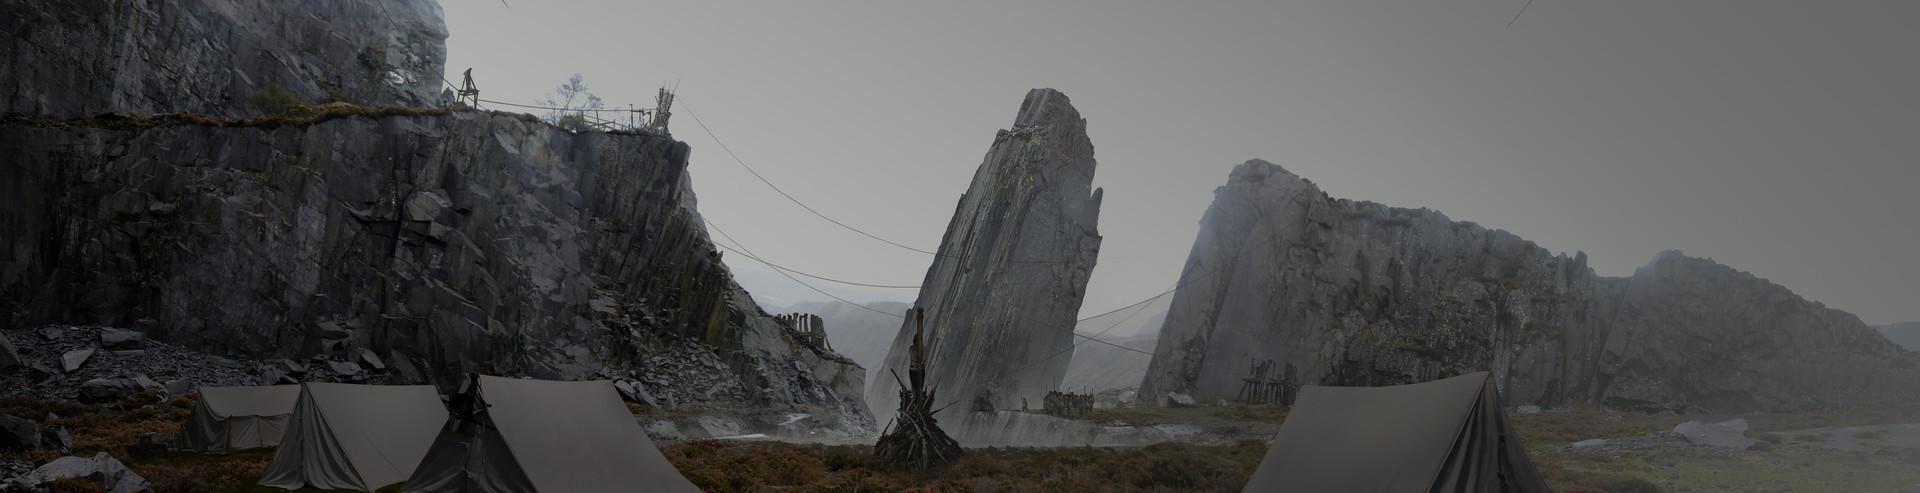 Andrei riabovitchev concept camp tarzan v003 ar